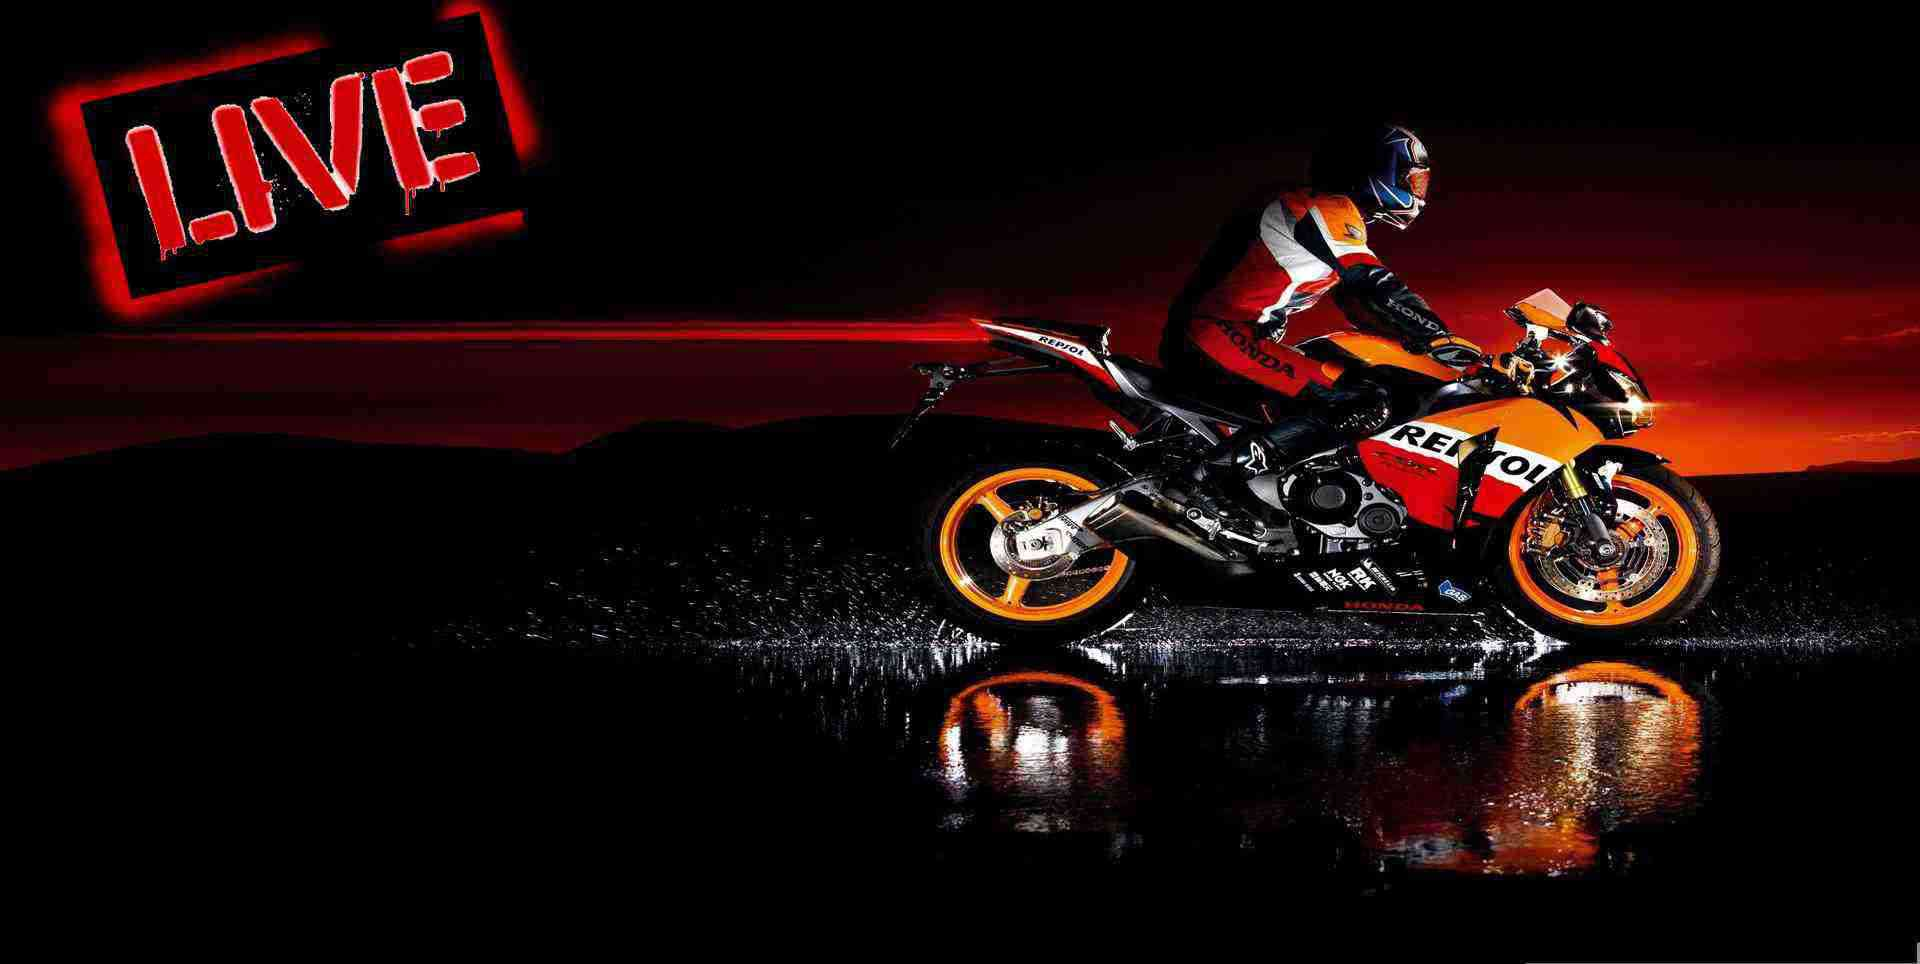 motogp-red-bull-grand-prix-2015-live-sreaming